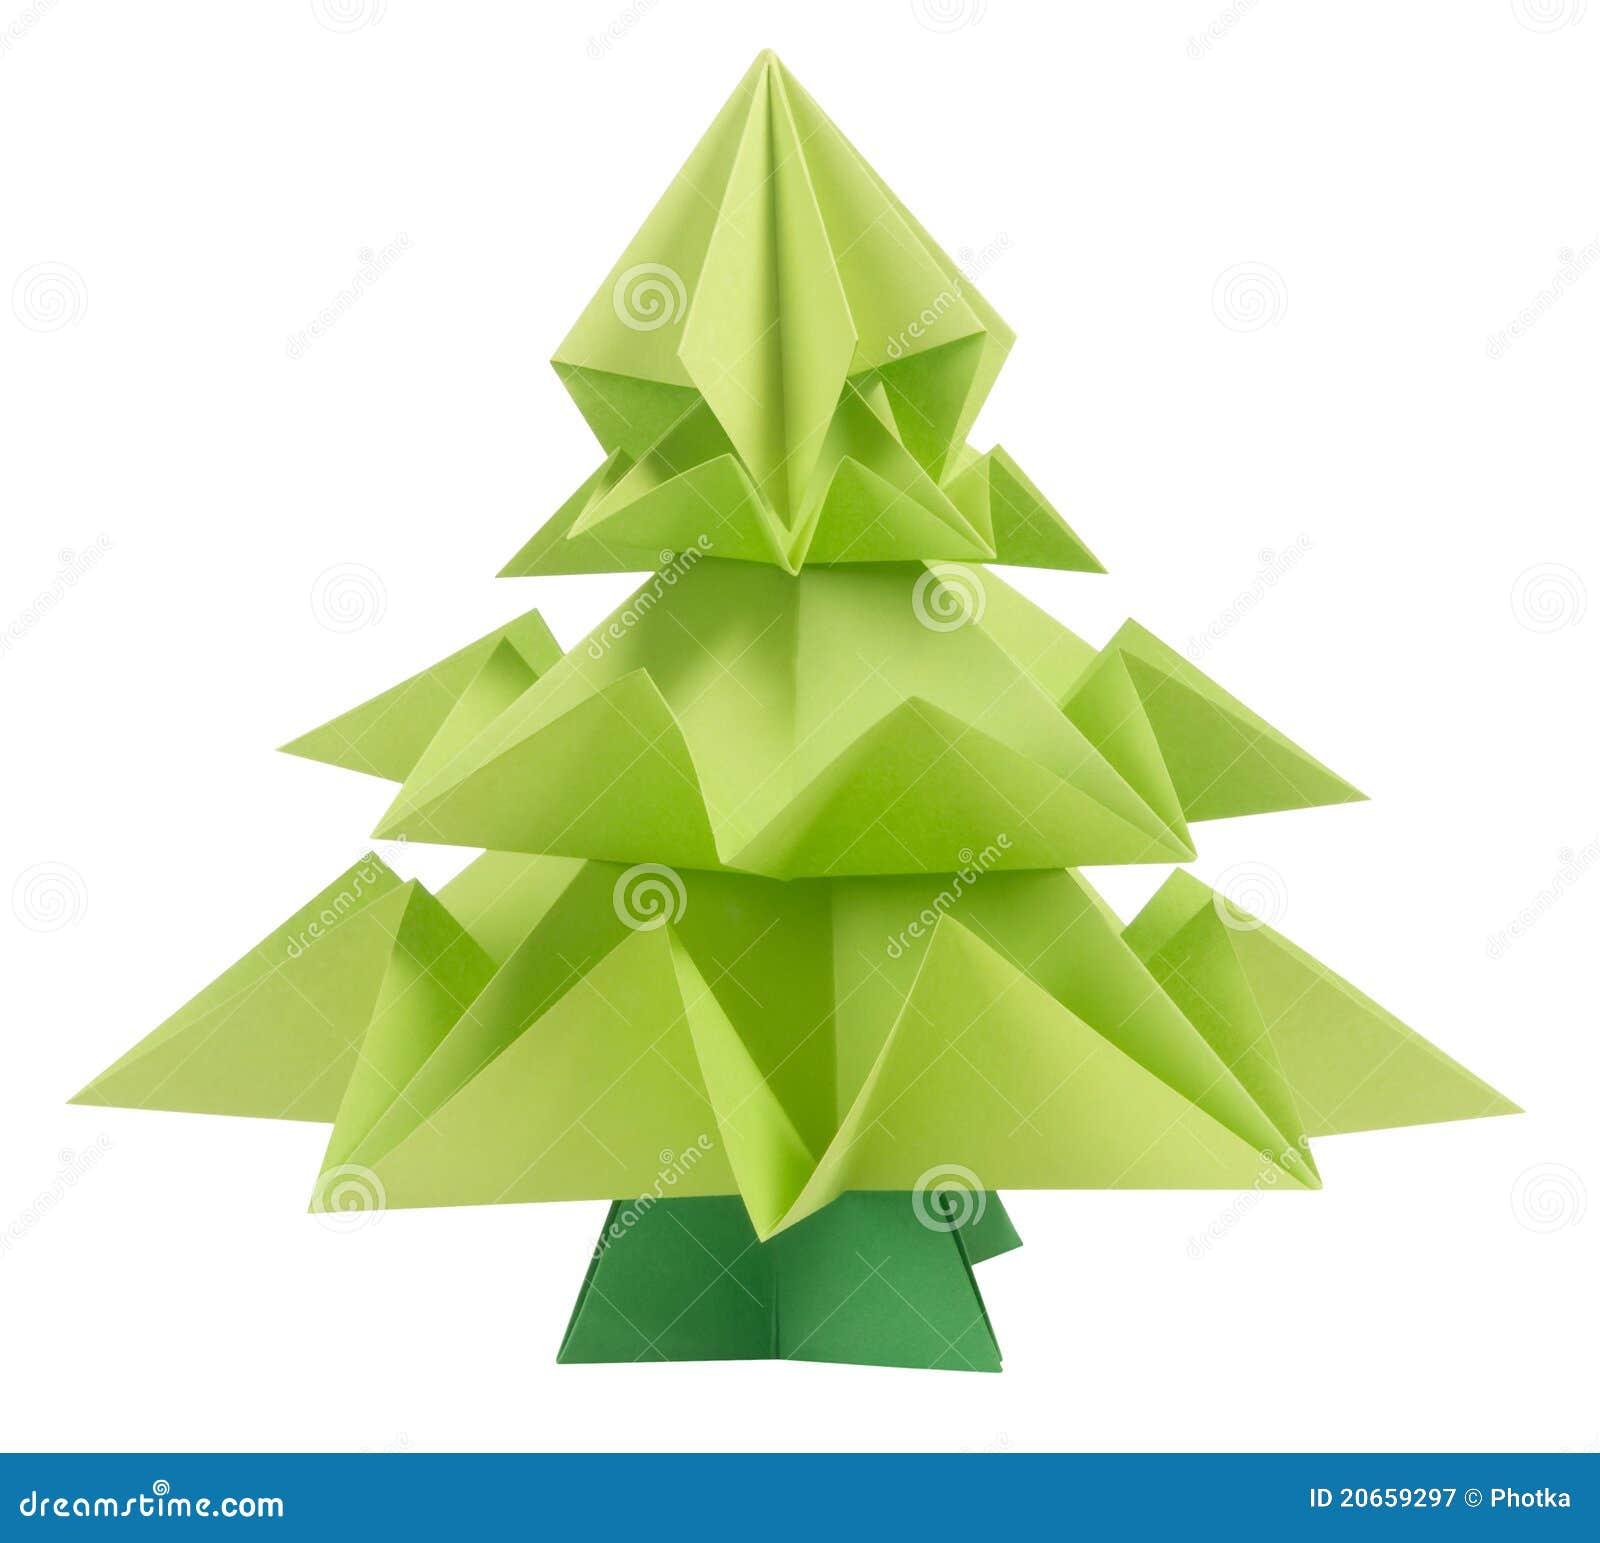 Origami Christmas Tree Royalty Free Stock Photography - Image ...